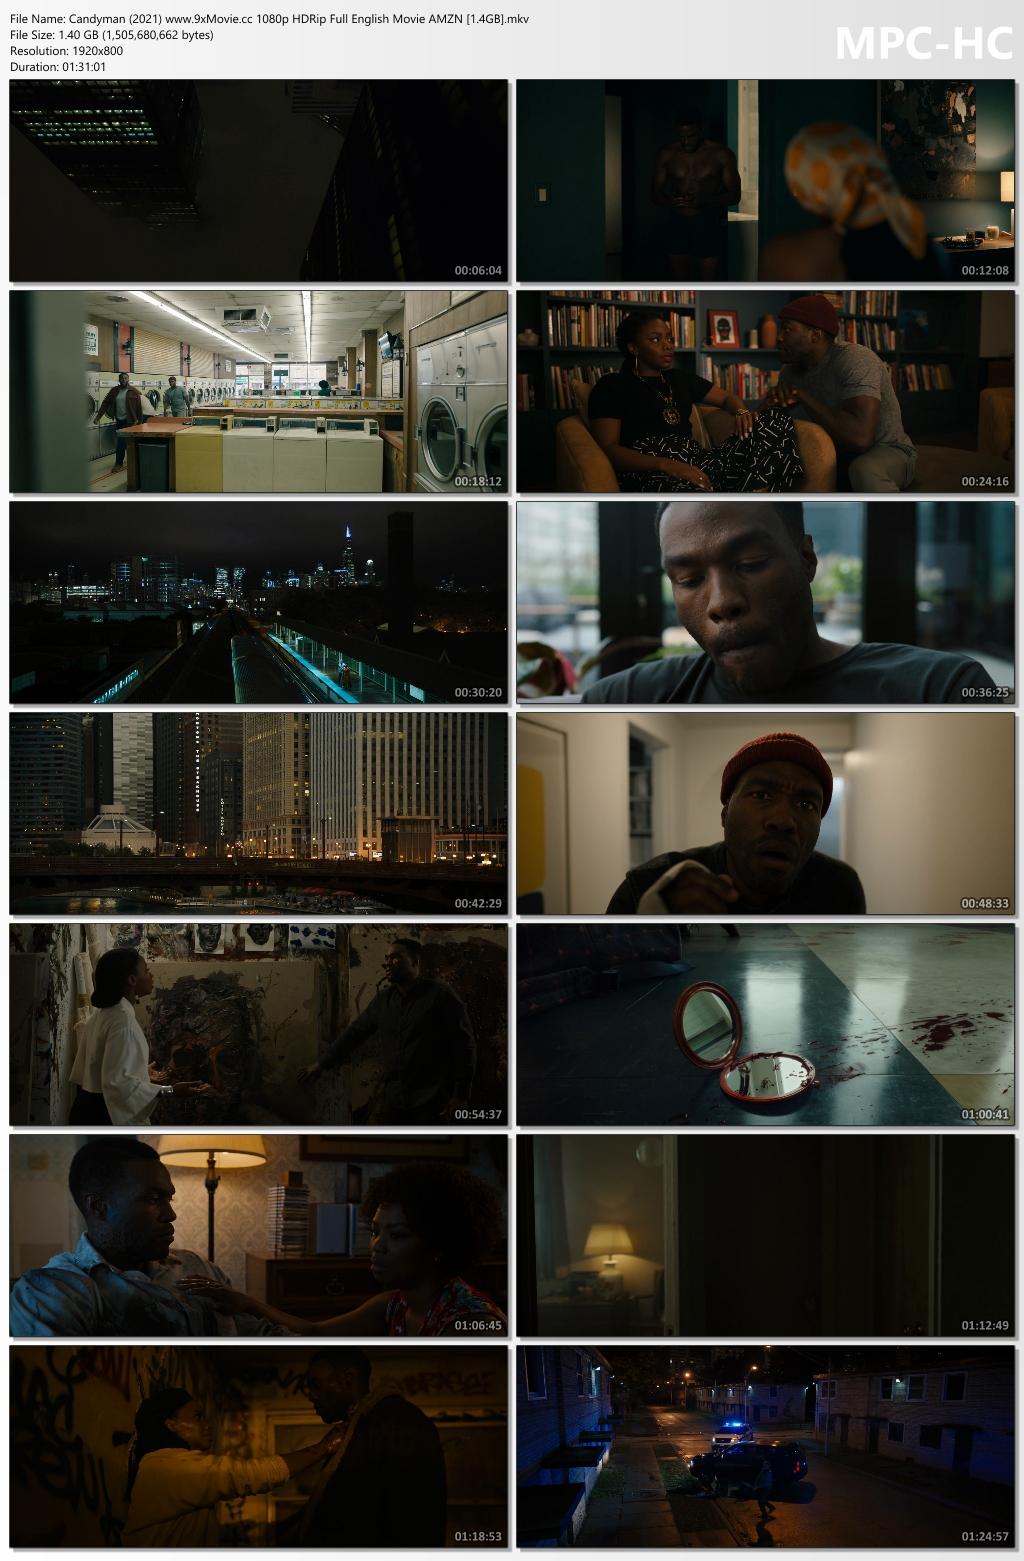 Candyman-2021-www-9x-Movie-cc-1080p-HDRip-Full-English-Movie-AMZN-1-4-GB-mkv